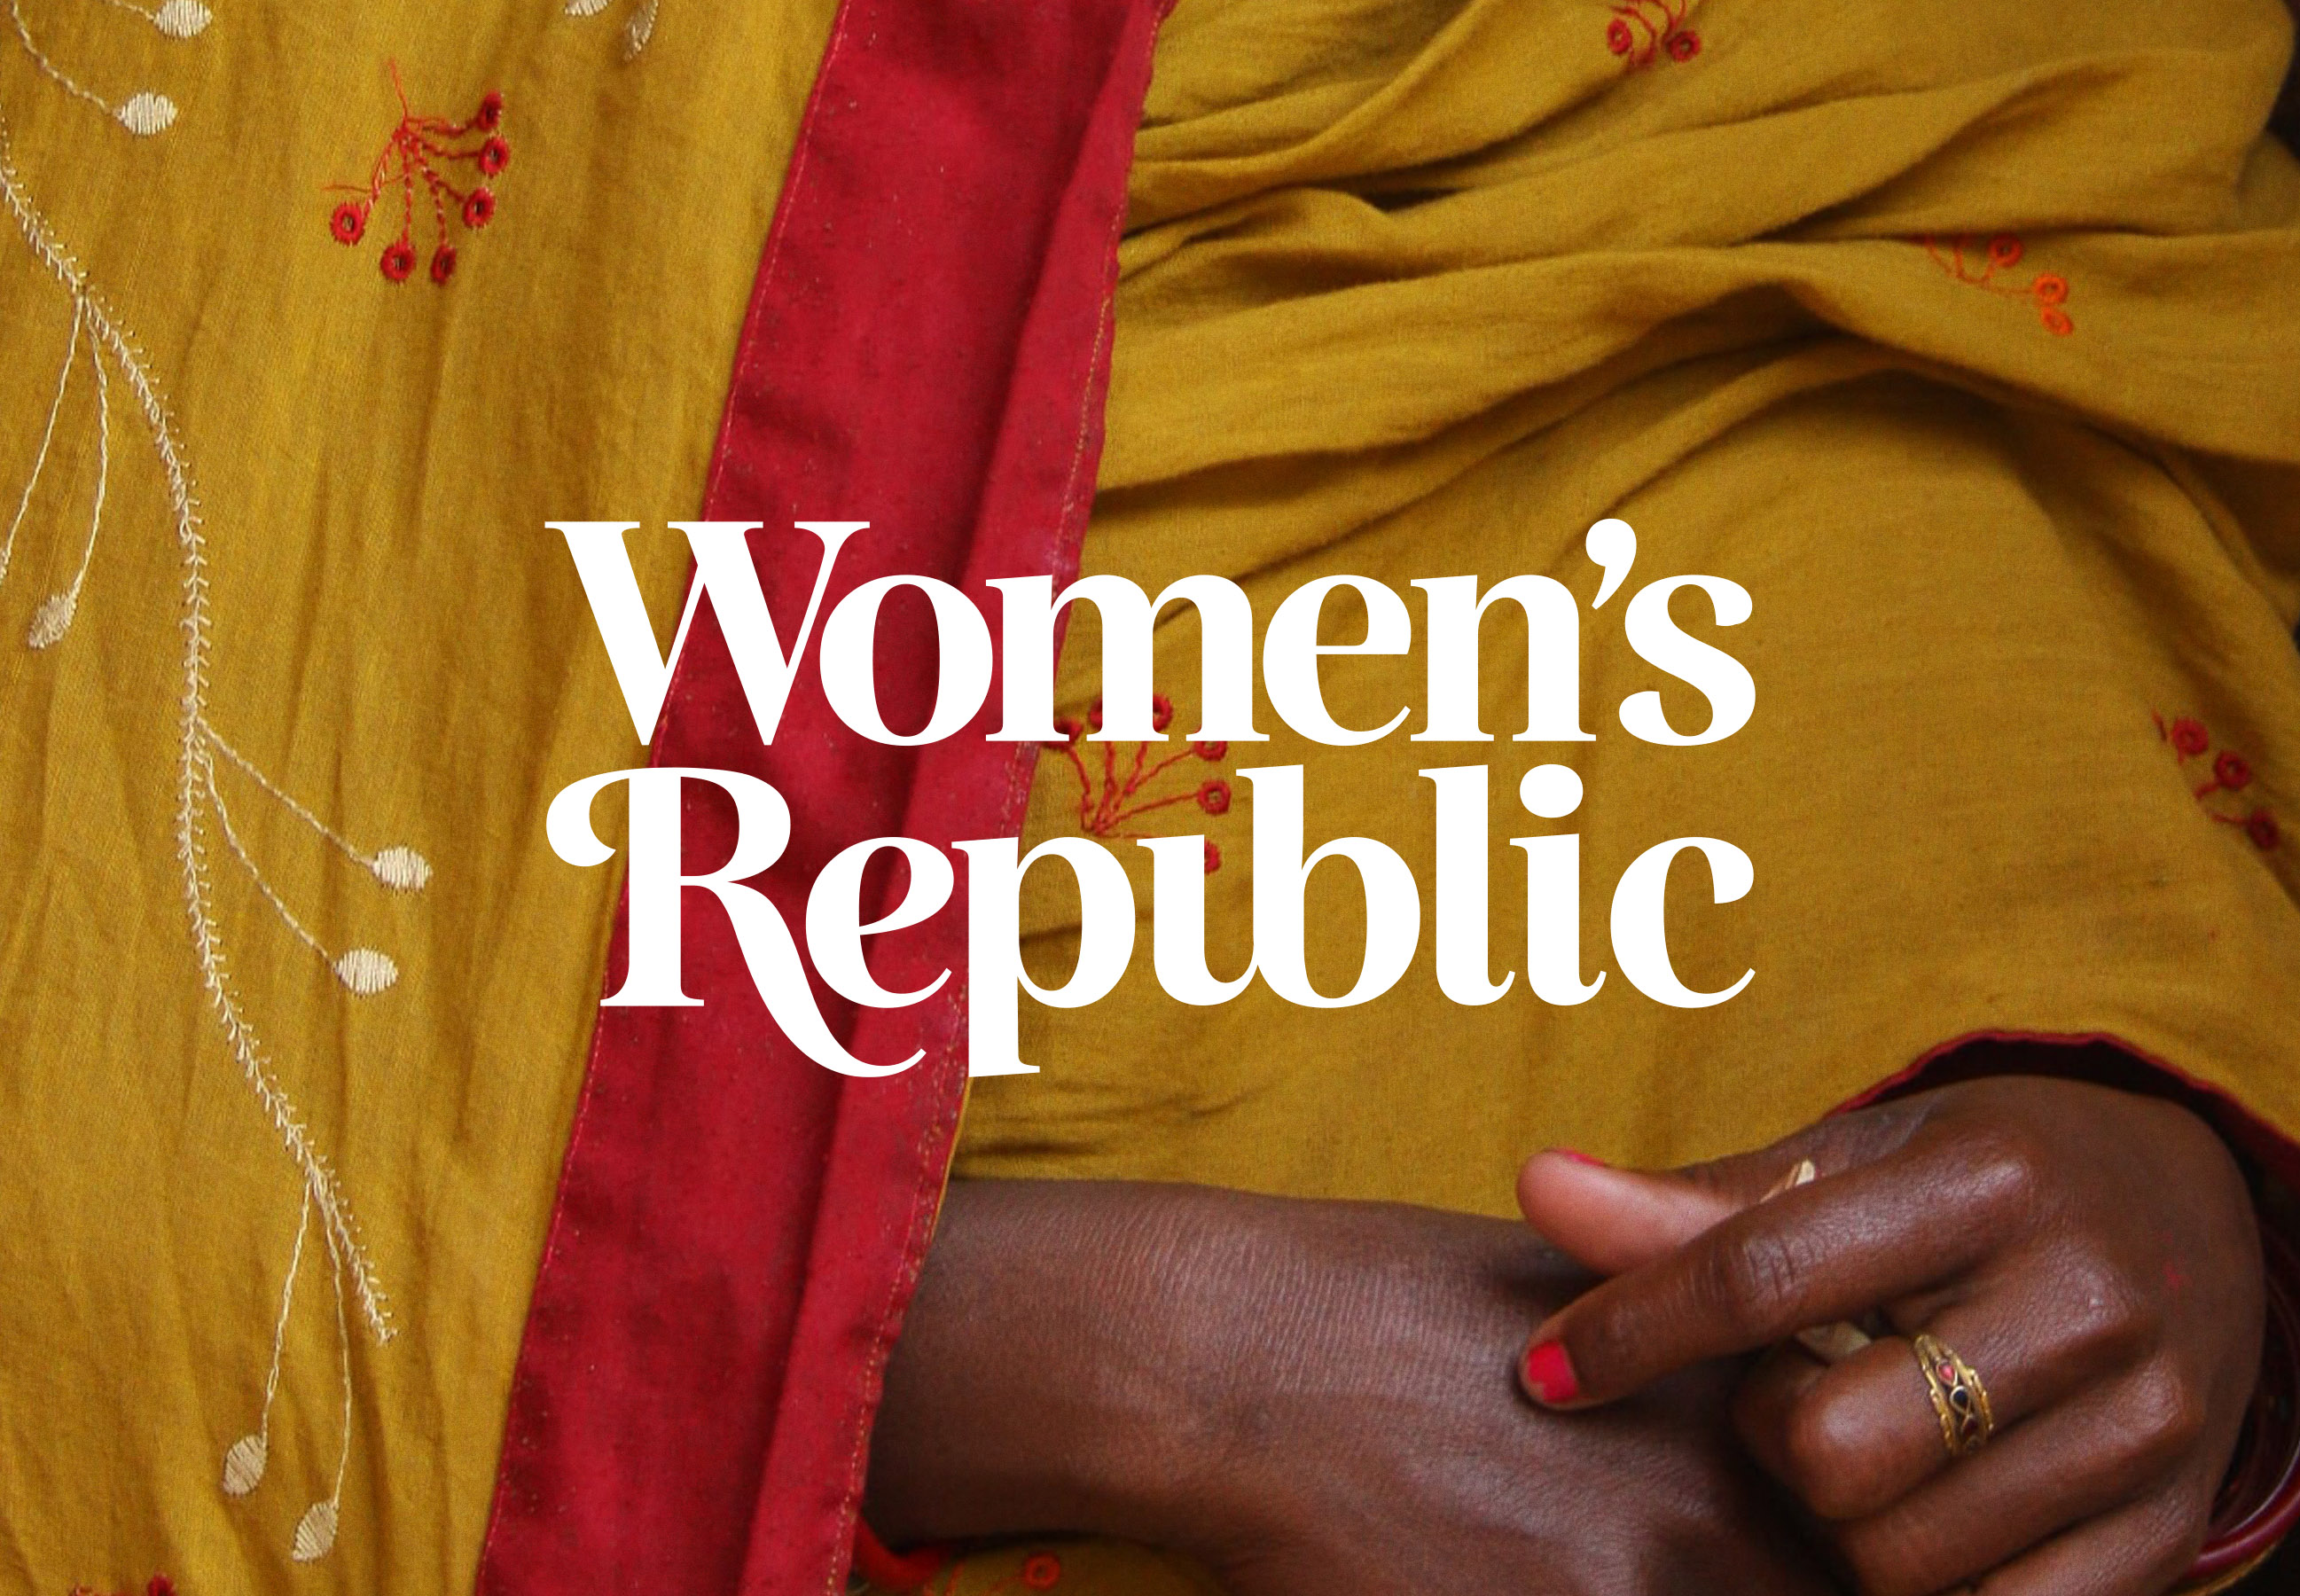 Visual Identity for Women's Republic Designed by Imran Latheef